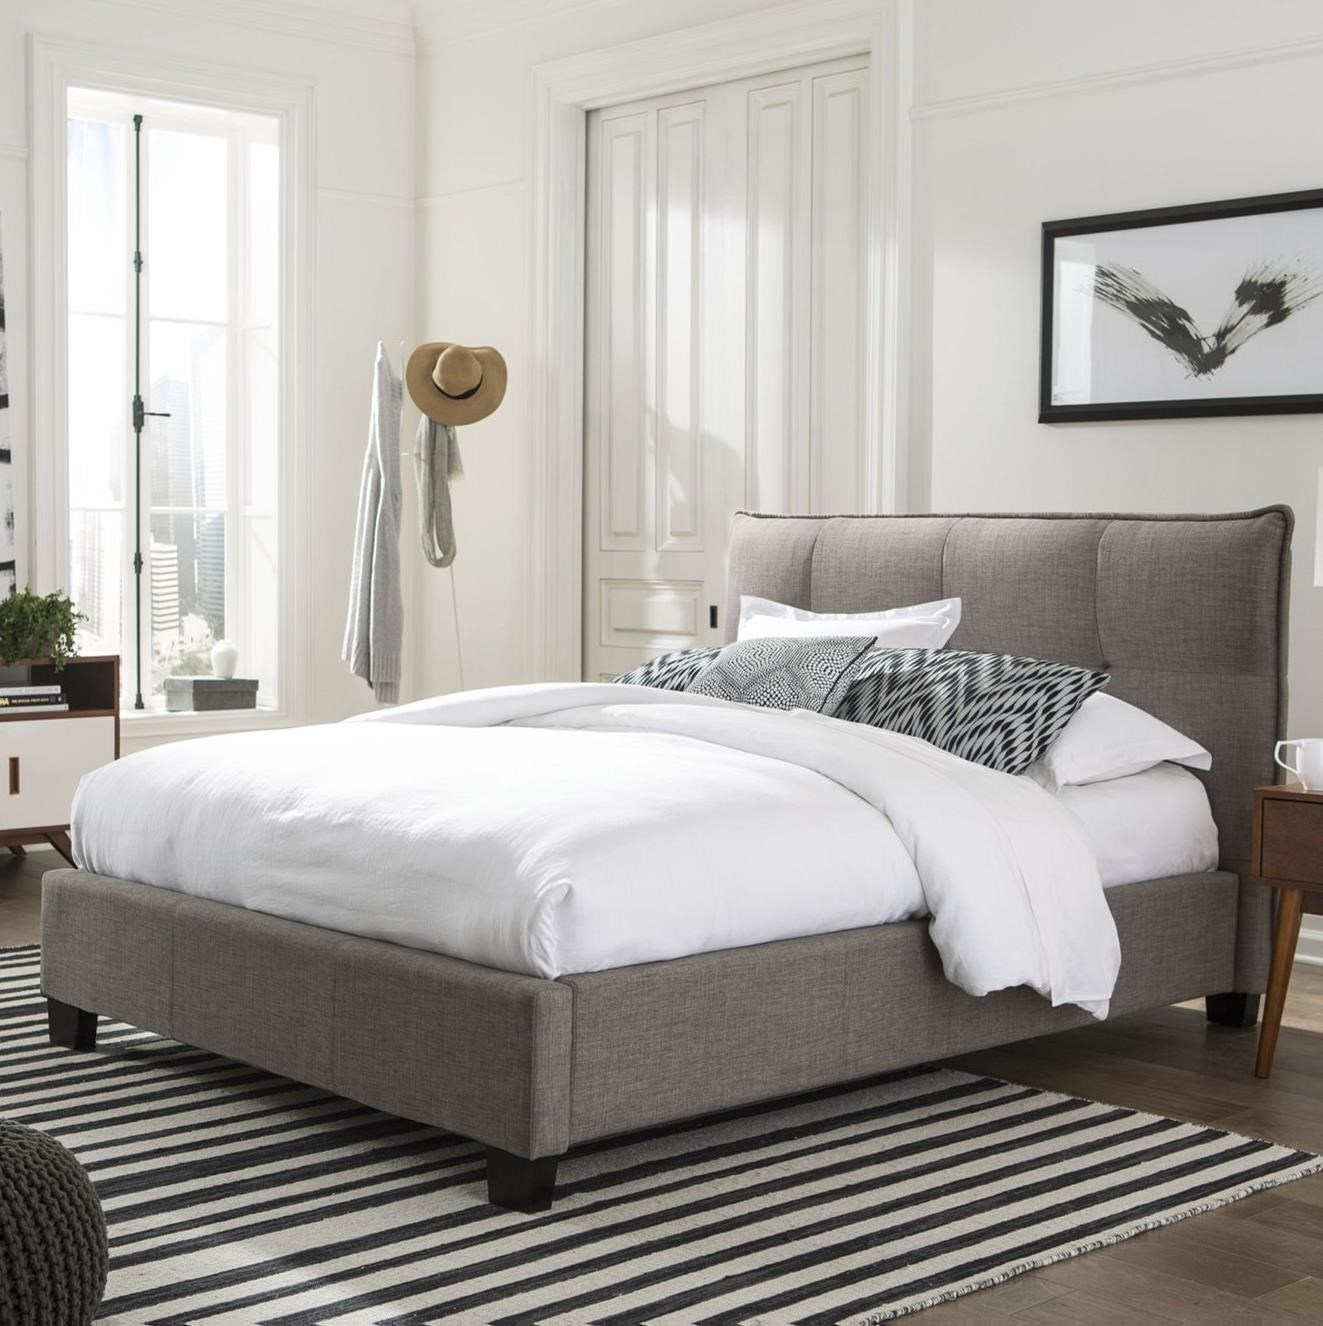 Geneva Queen Adona Platform Storage Bed at Sadler's Home Furnishings